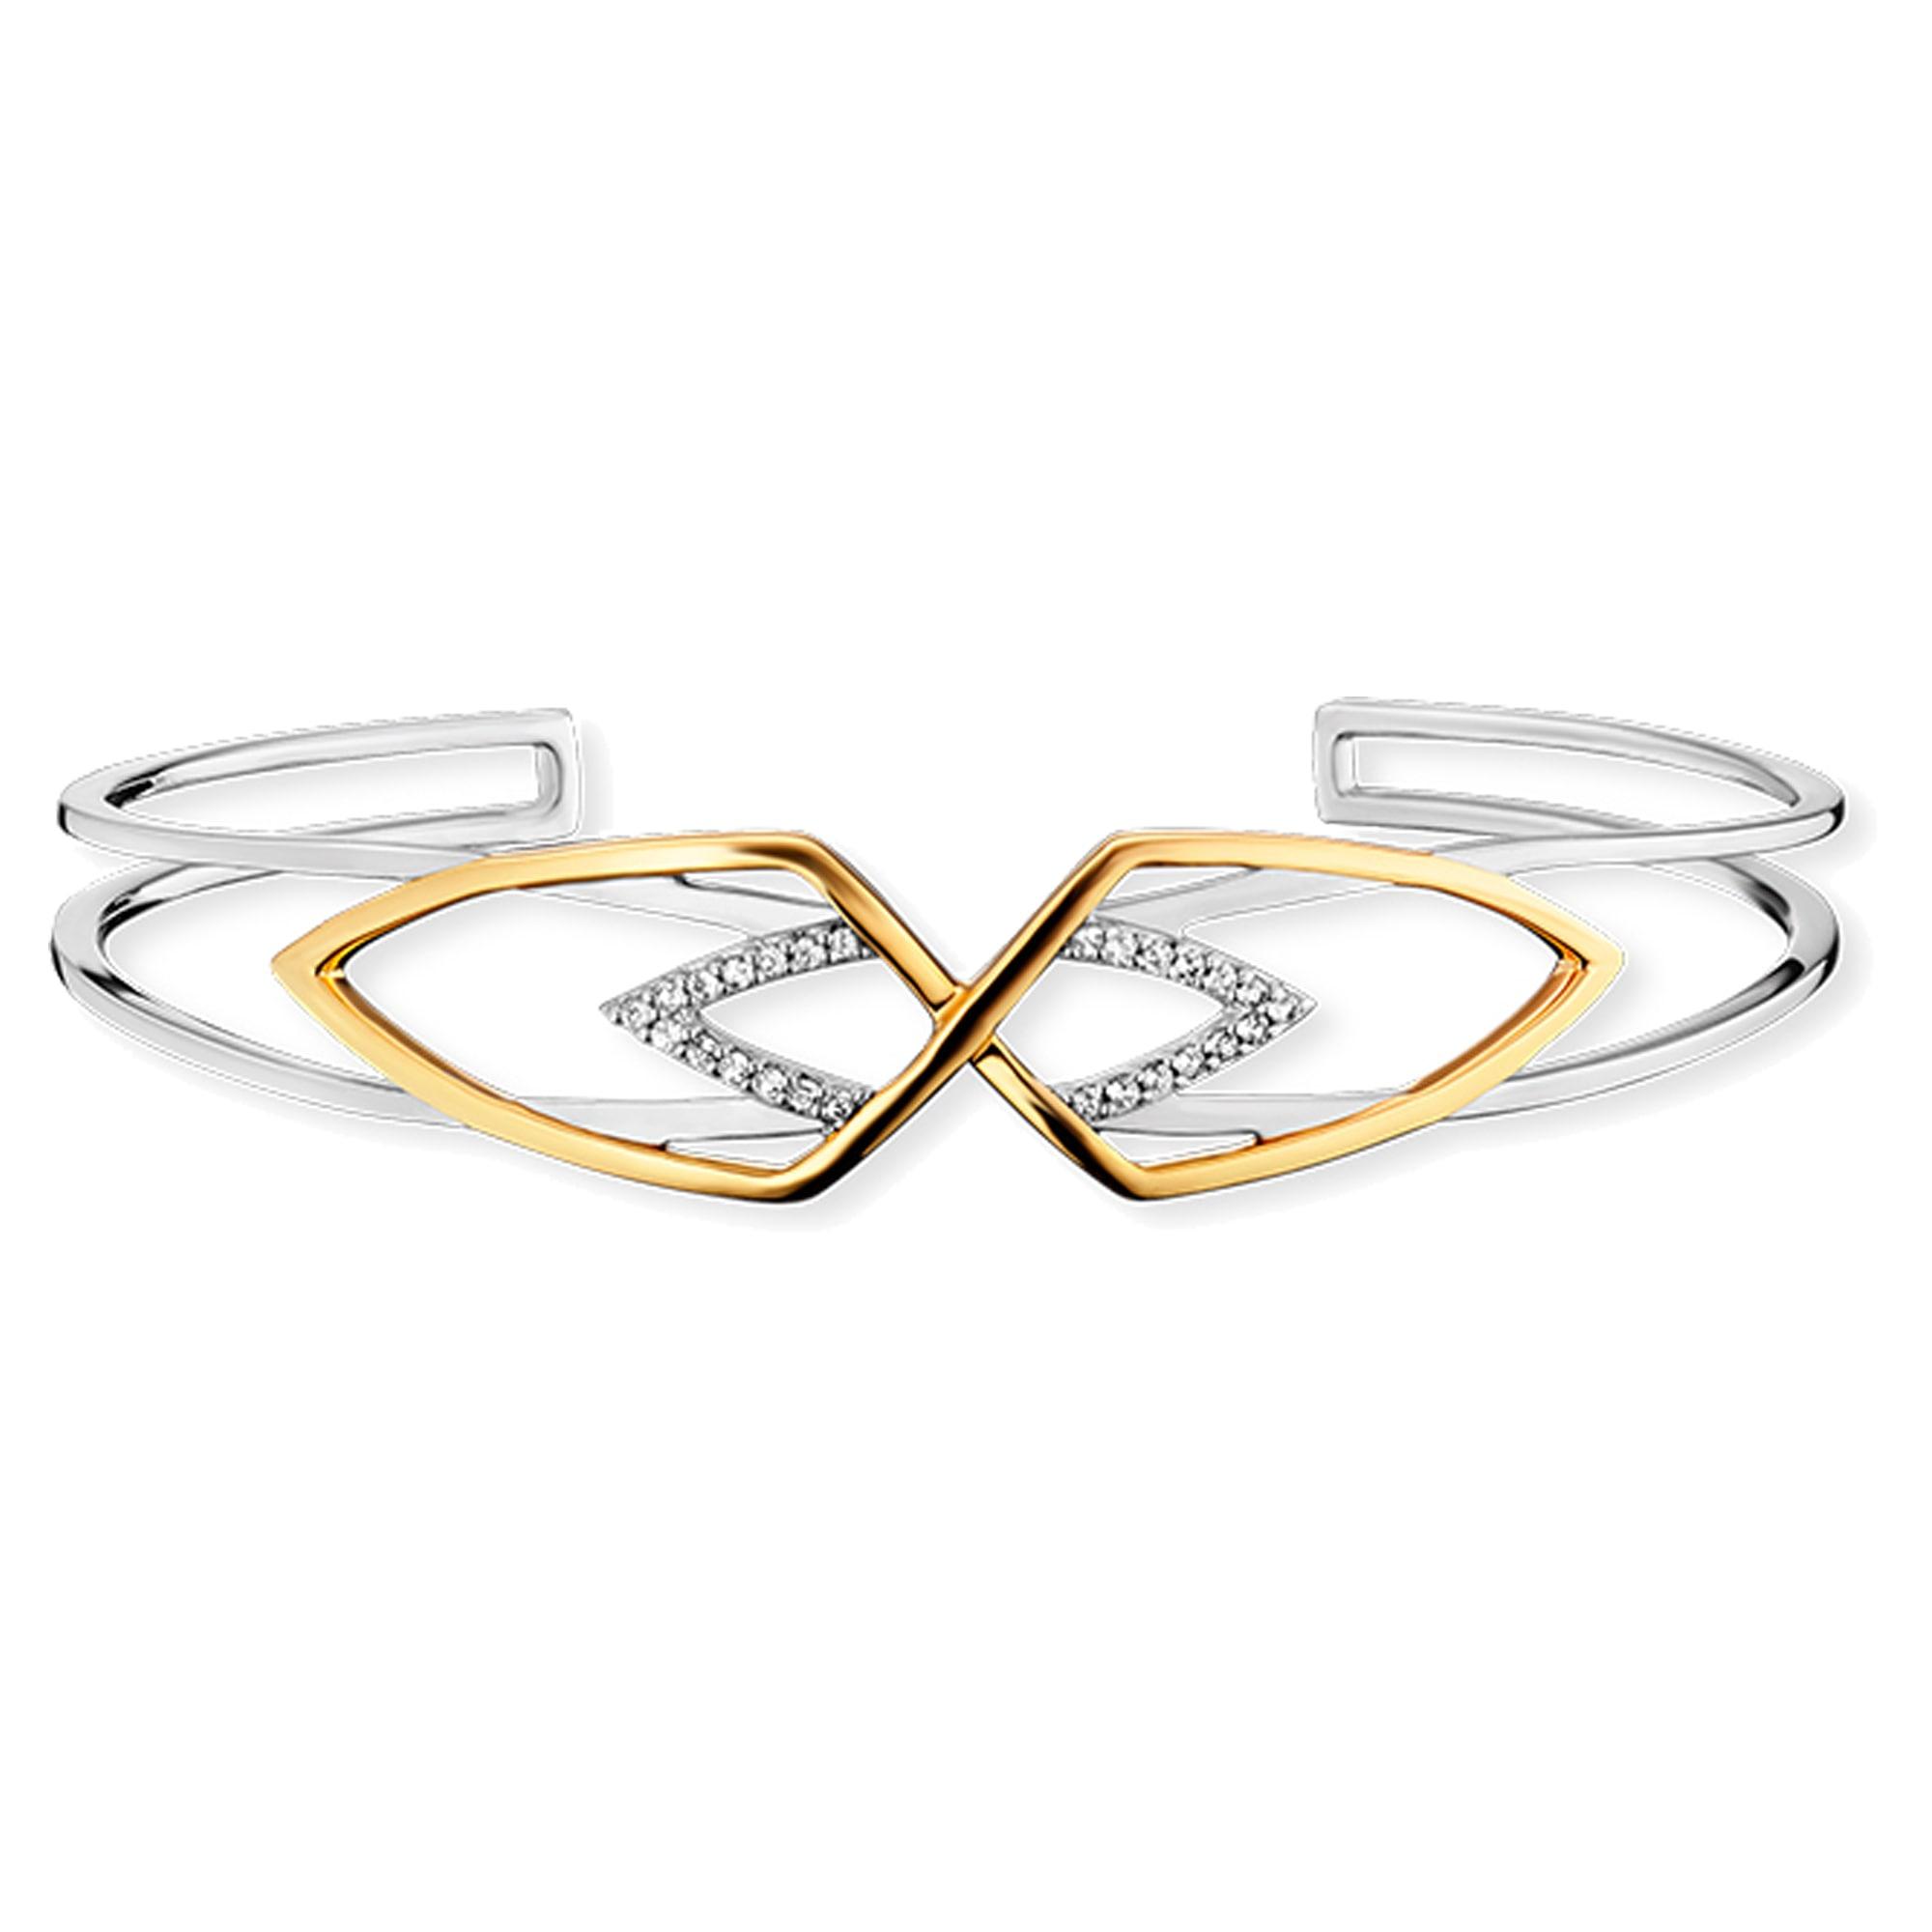 CAÏ Armreif 925/- Sterling Silber zweifarbig Topas | Schmuck > Armbänder > Armreifen | Caï